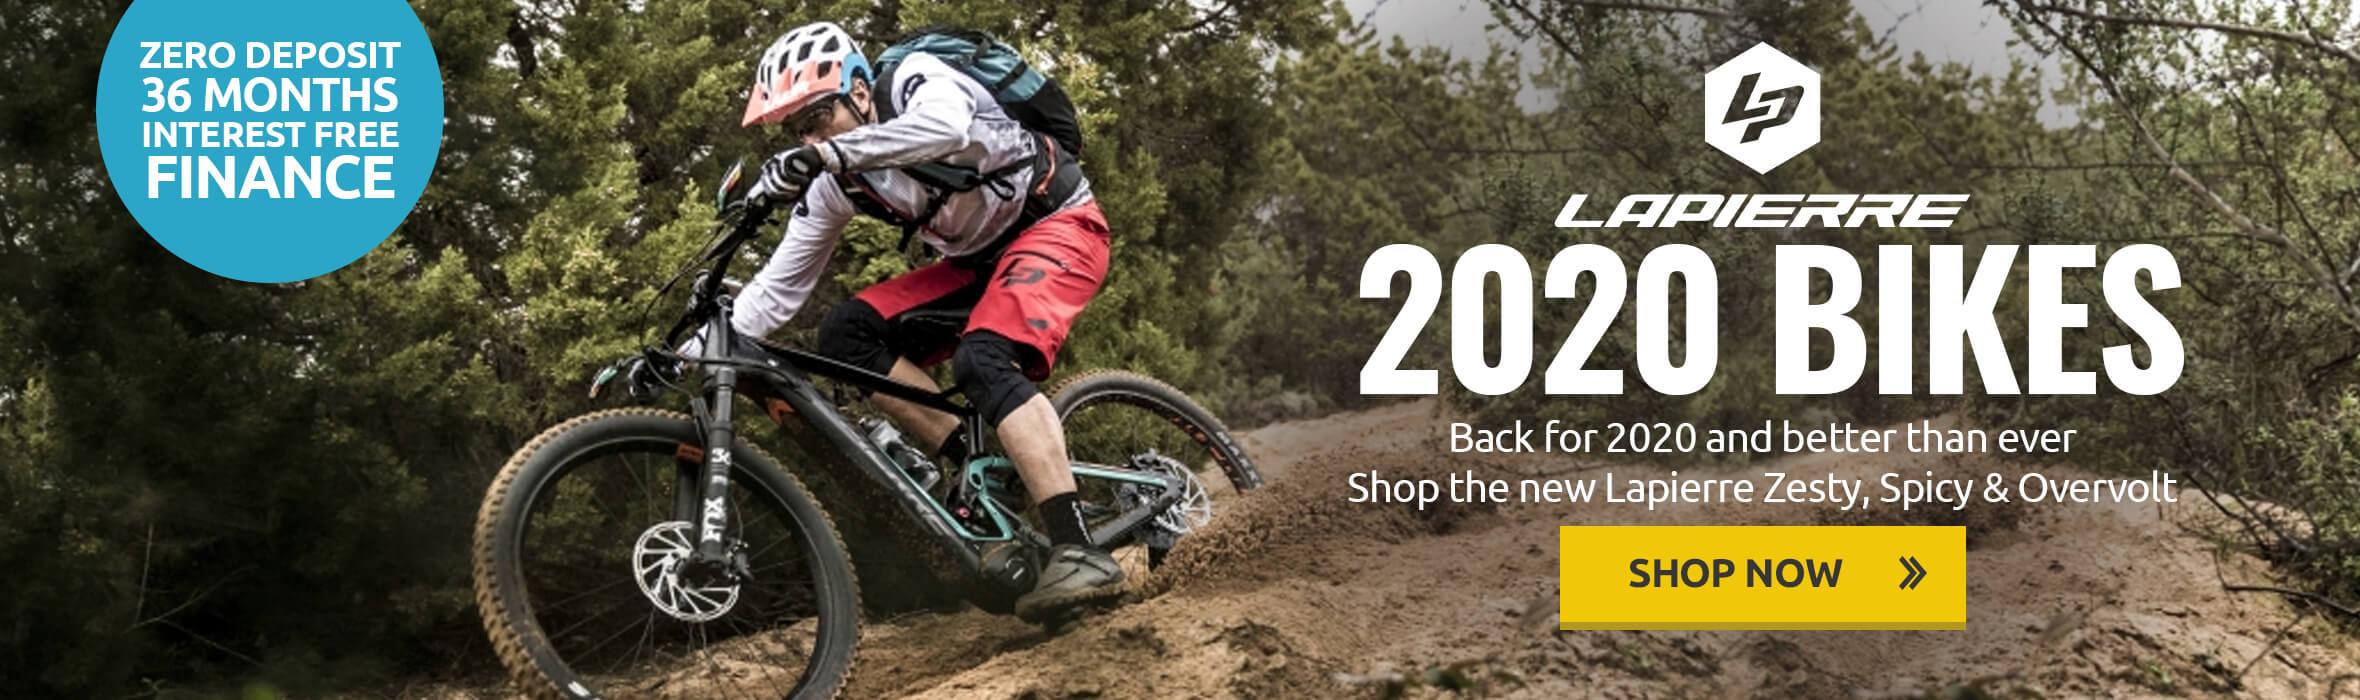 Lapierre 2020 Bikes - Zero Deposit Interest Free Finance Available - FREE Tweeks Tool Kit